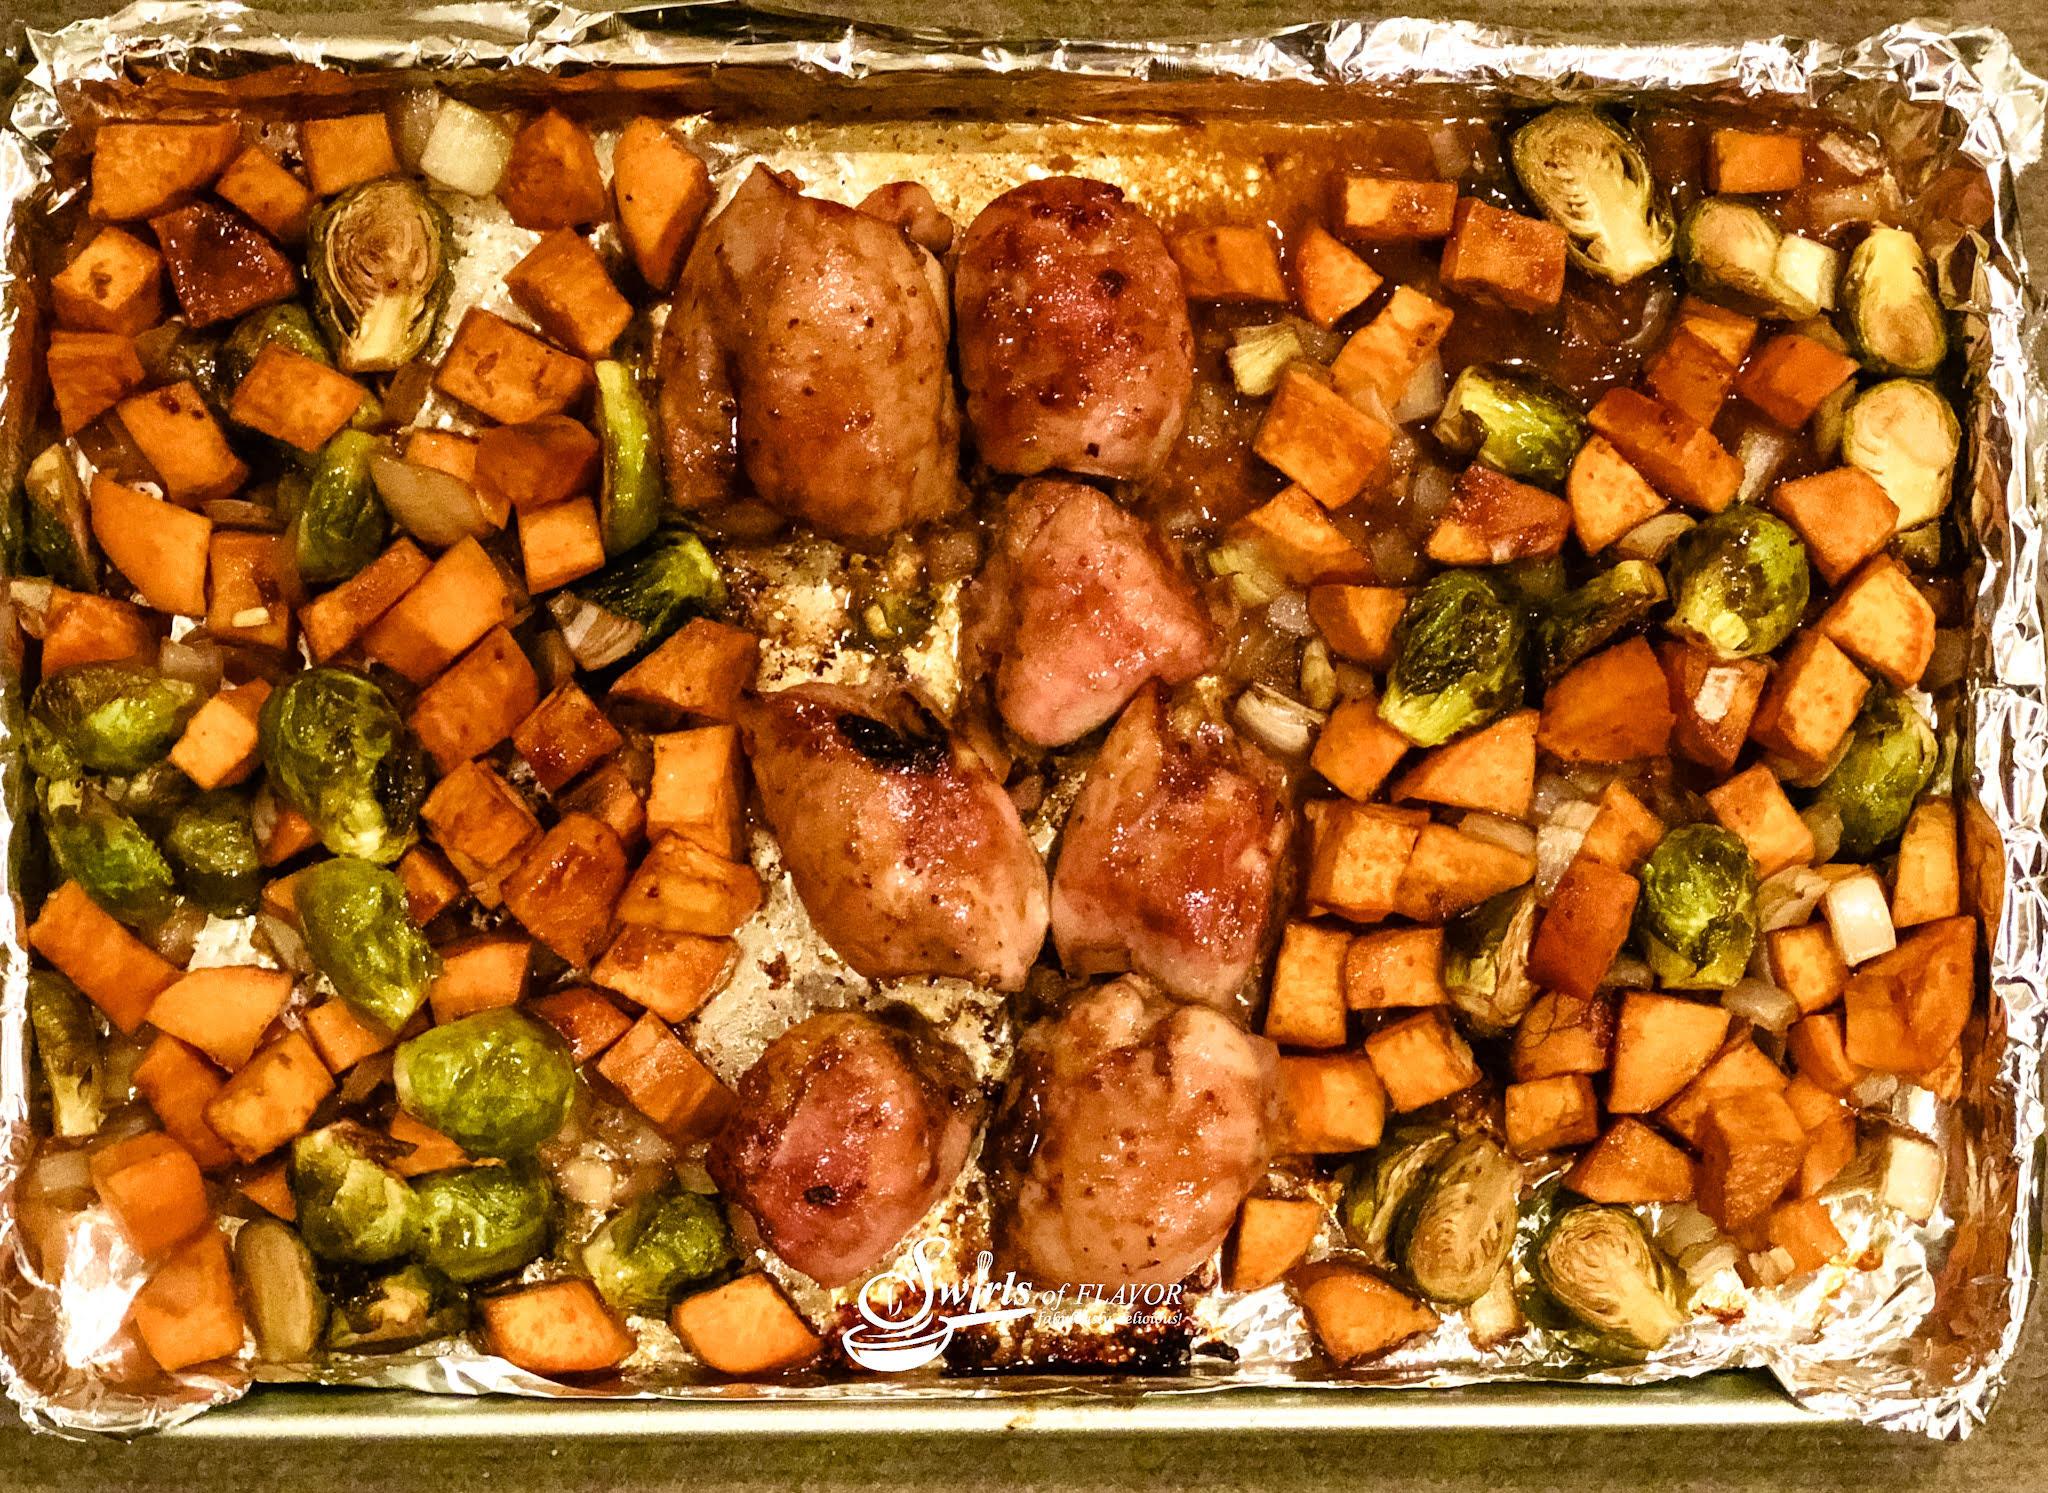 Sheet Pan Balsamic chicken in pan after cooking